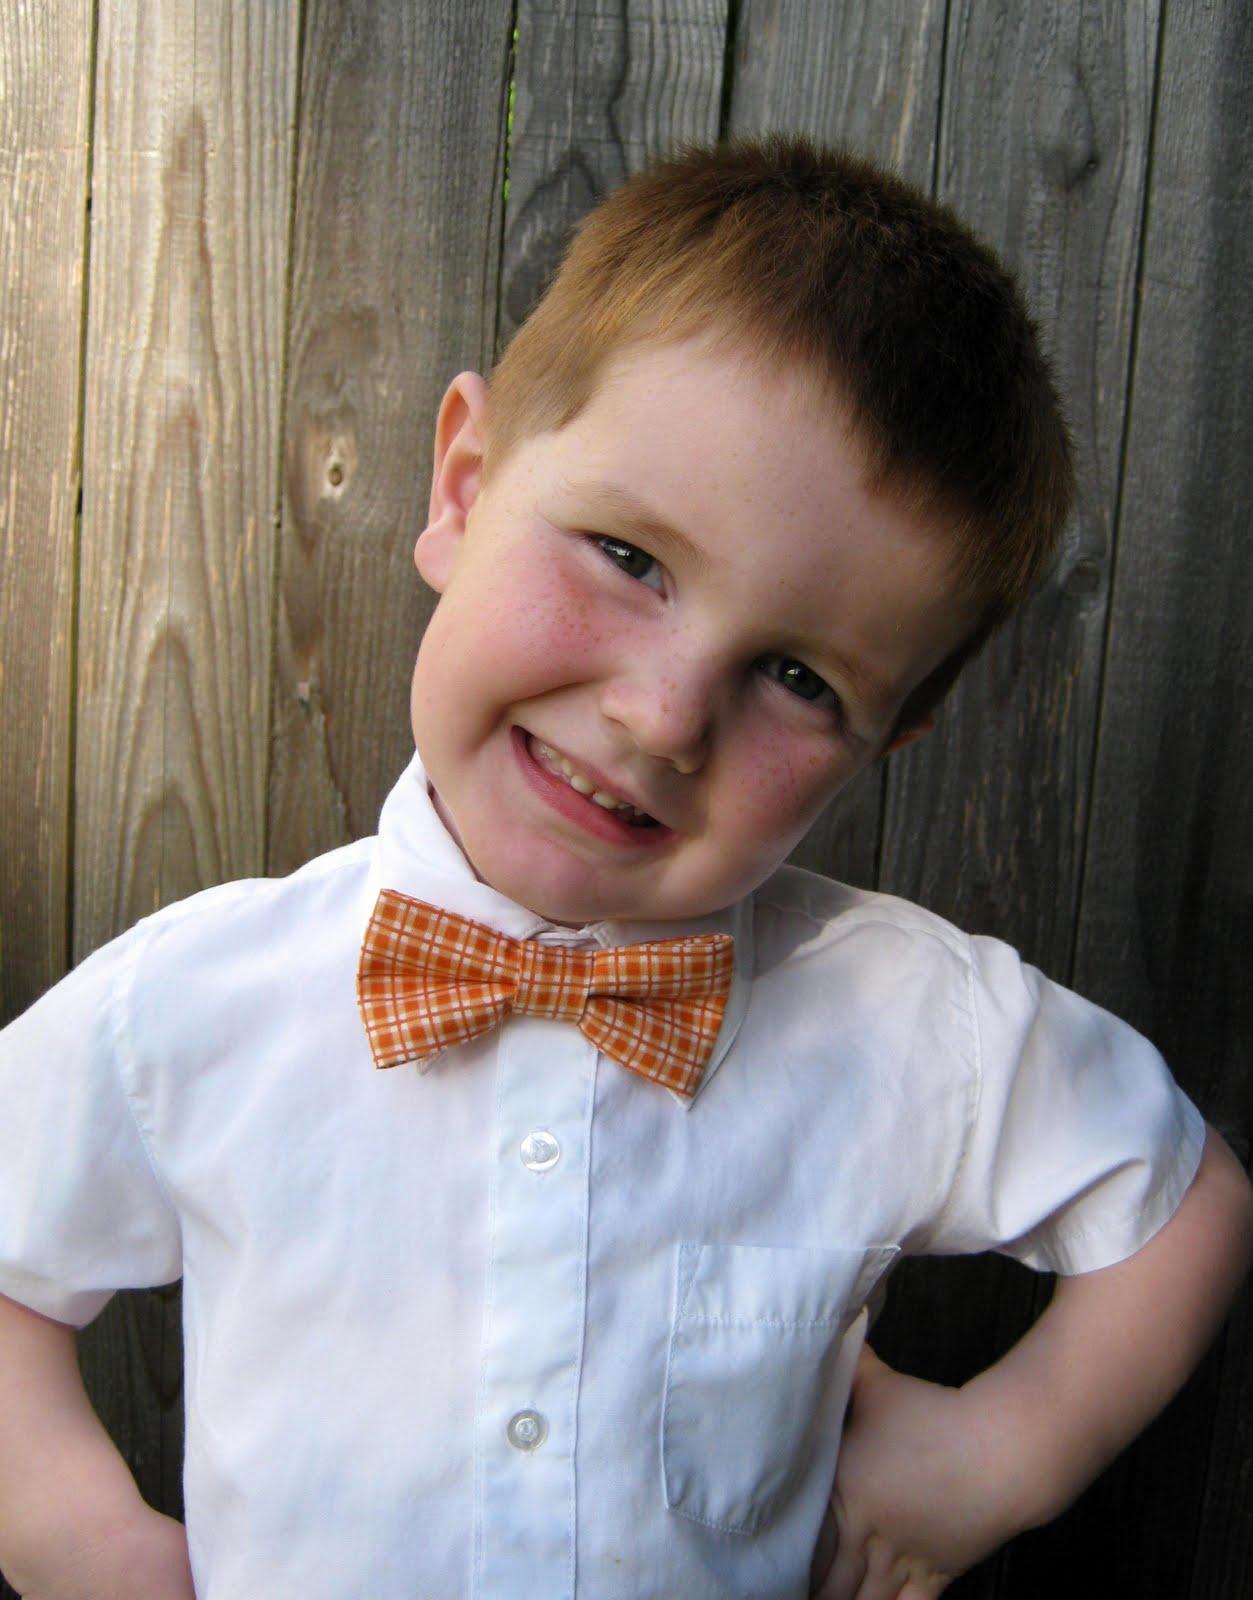 Boys' Bow Ties: Seersucker | The Cordial Churchman  |Bow Ties For Boys